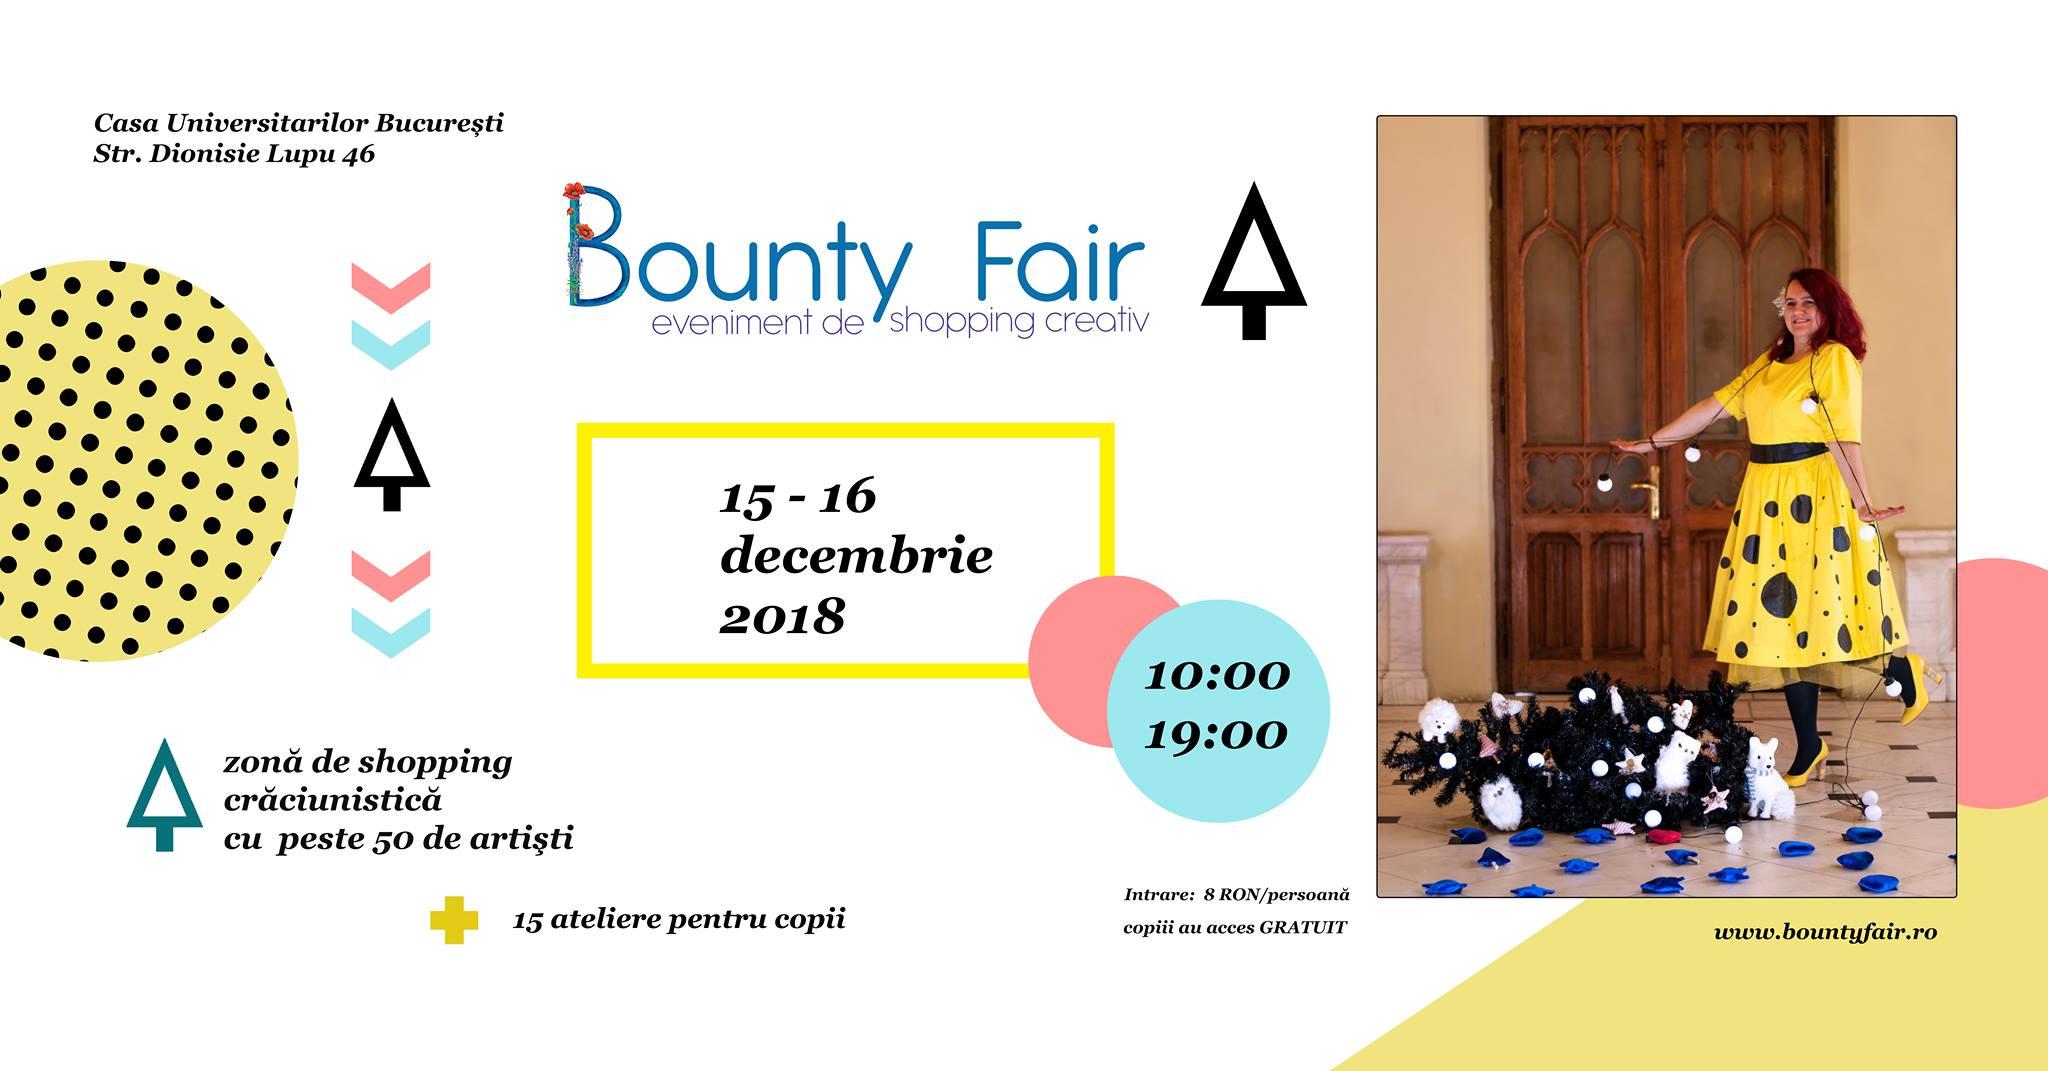 Bounty Fair #40 Ediție veselă de Crăciun